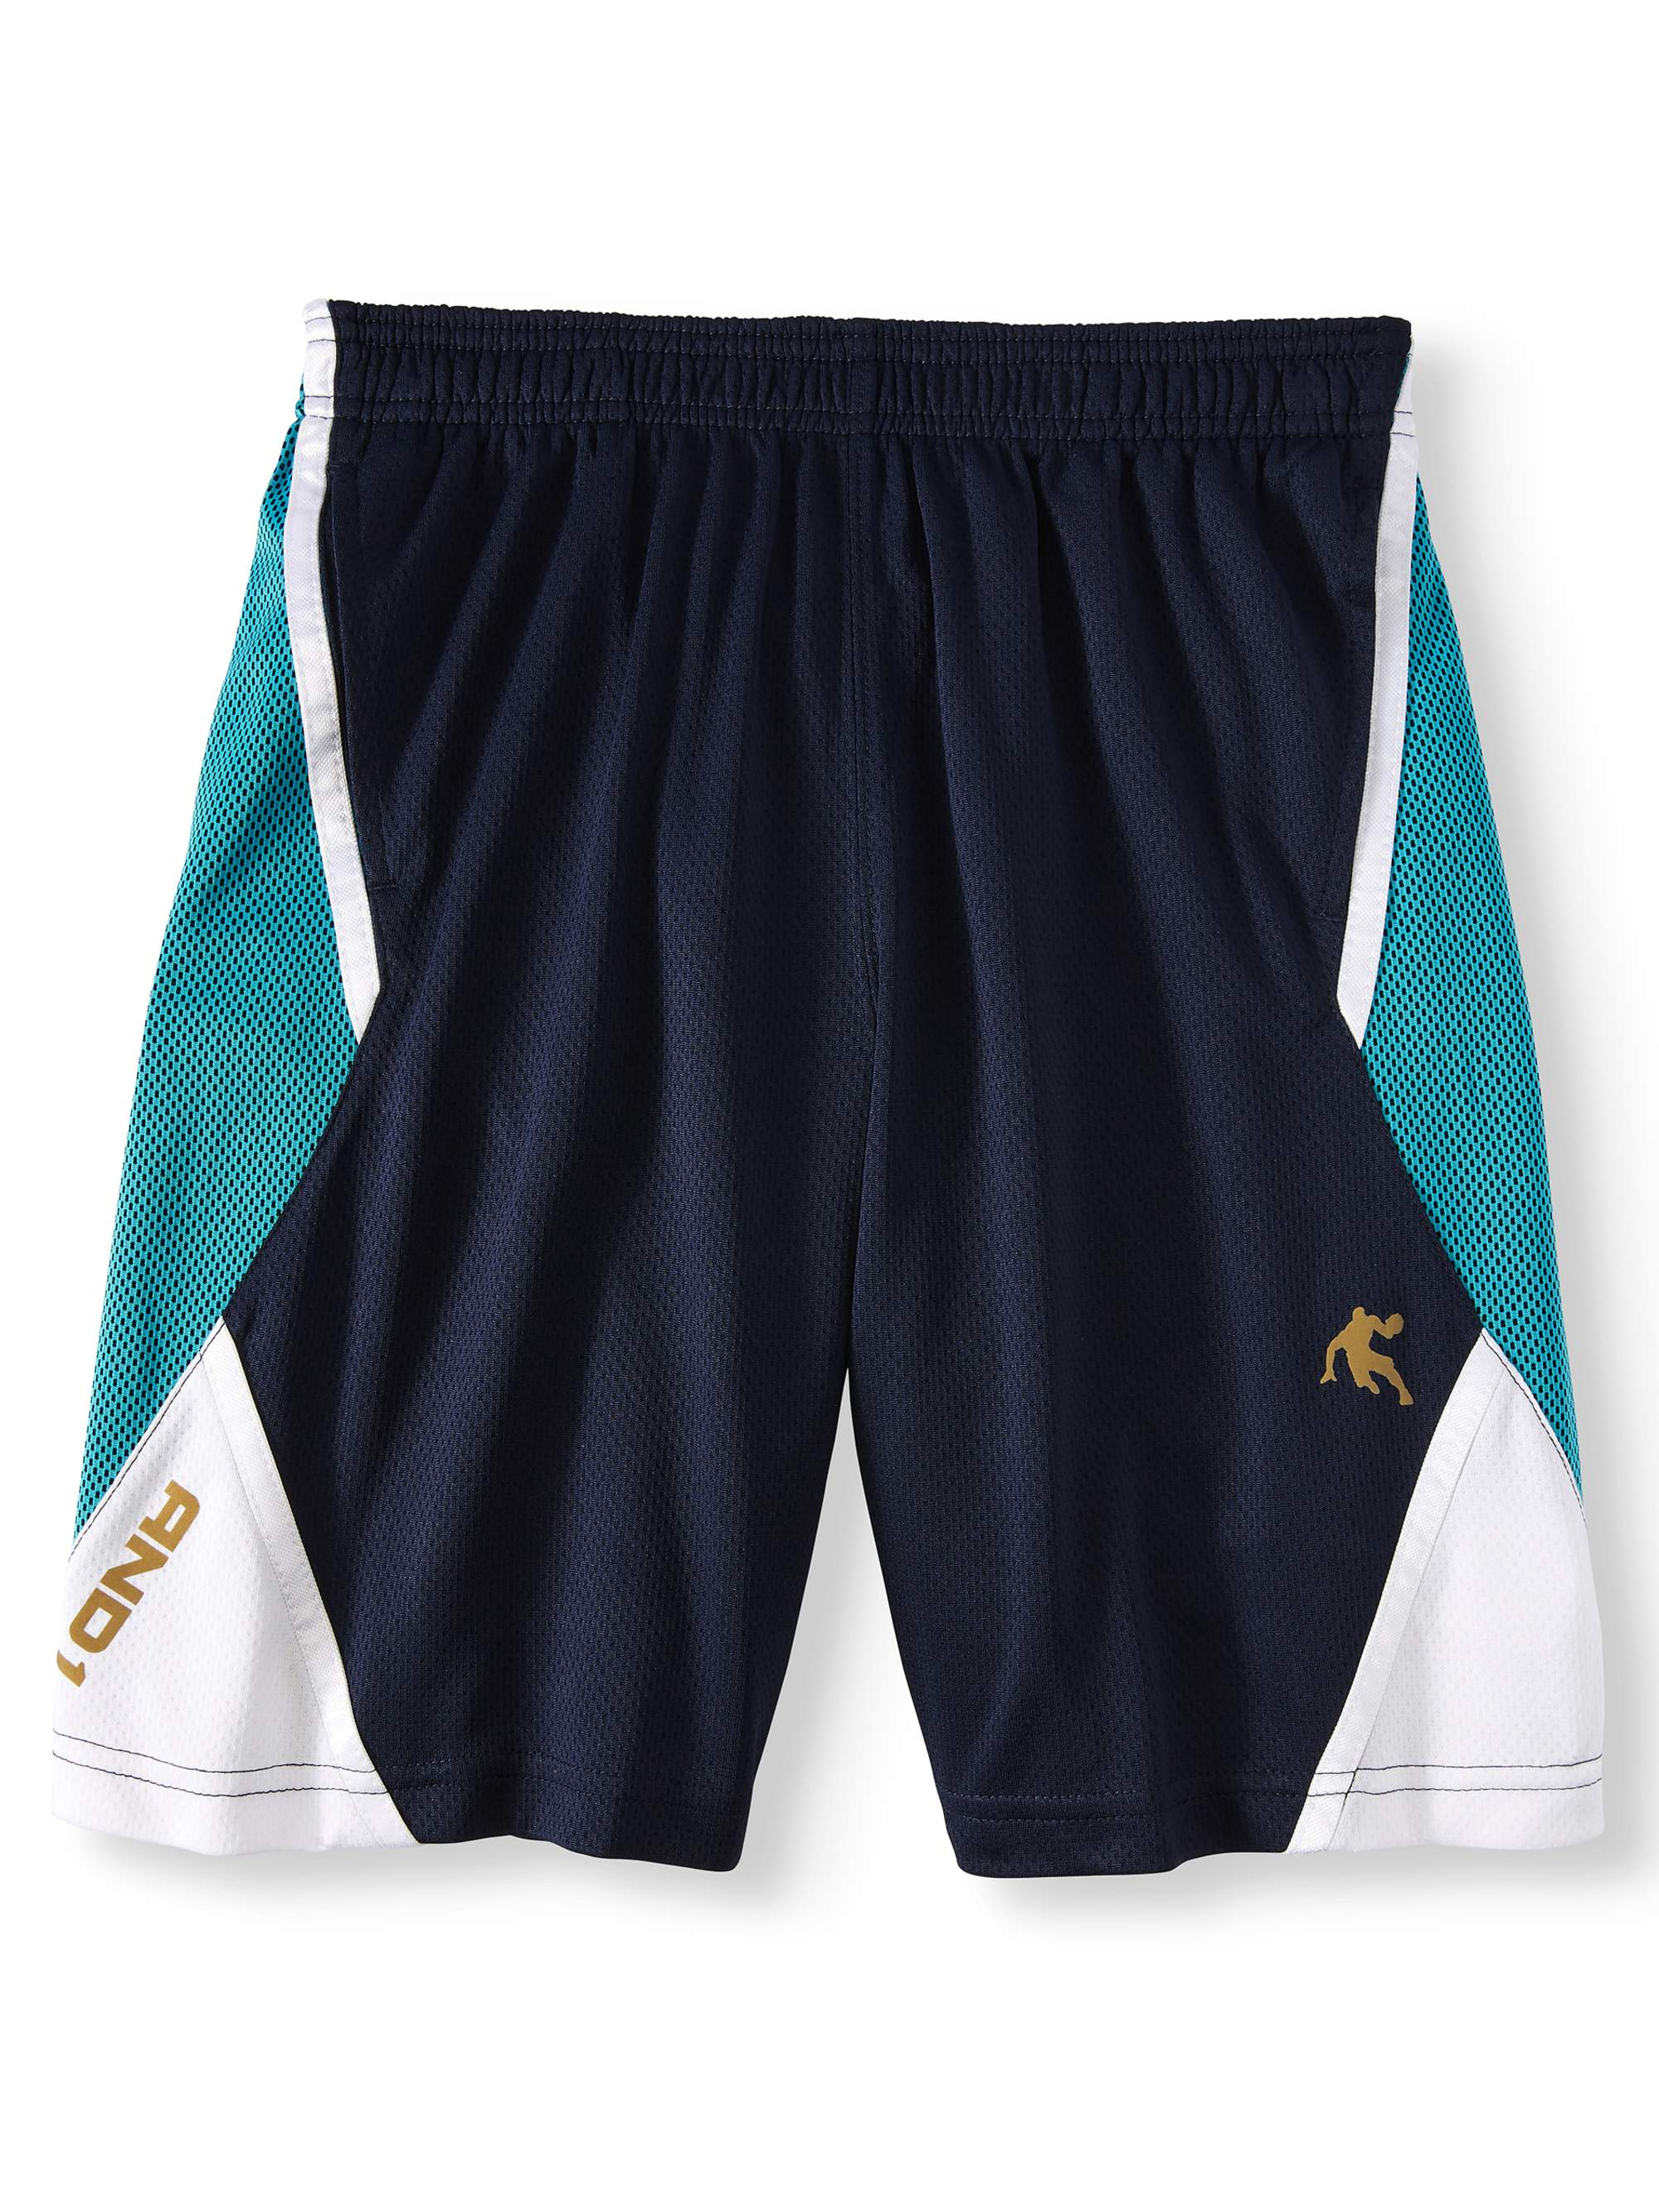 Polyester Mesh Layup Basketball Shorts with Pockets (Little Boys & Big Boys)